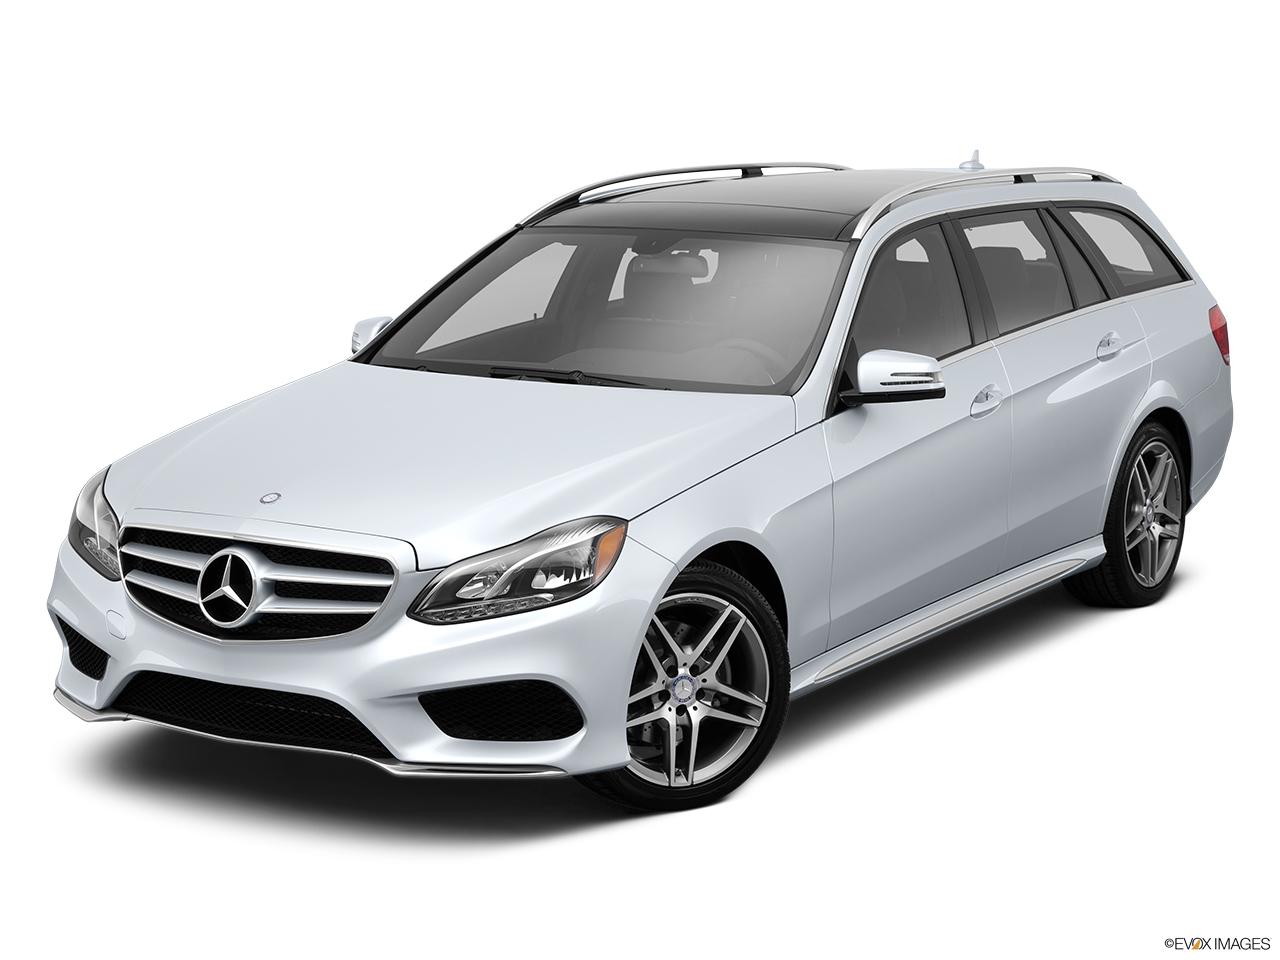 2014 Mercedes Benz E Class Wagon E350 Luxury 4matic